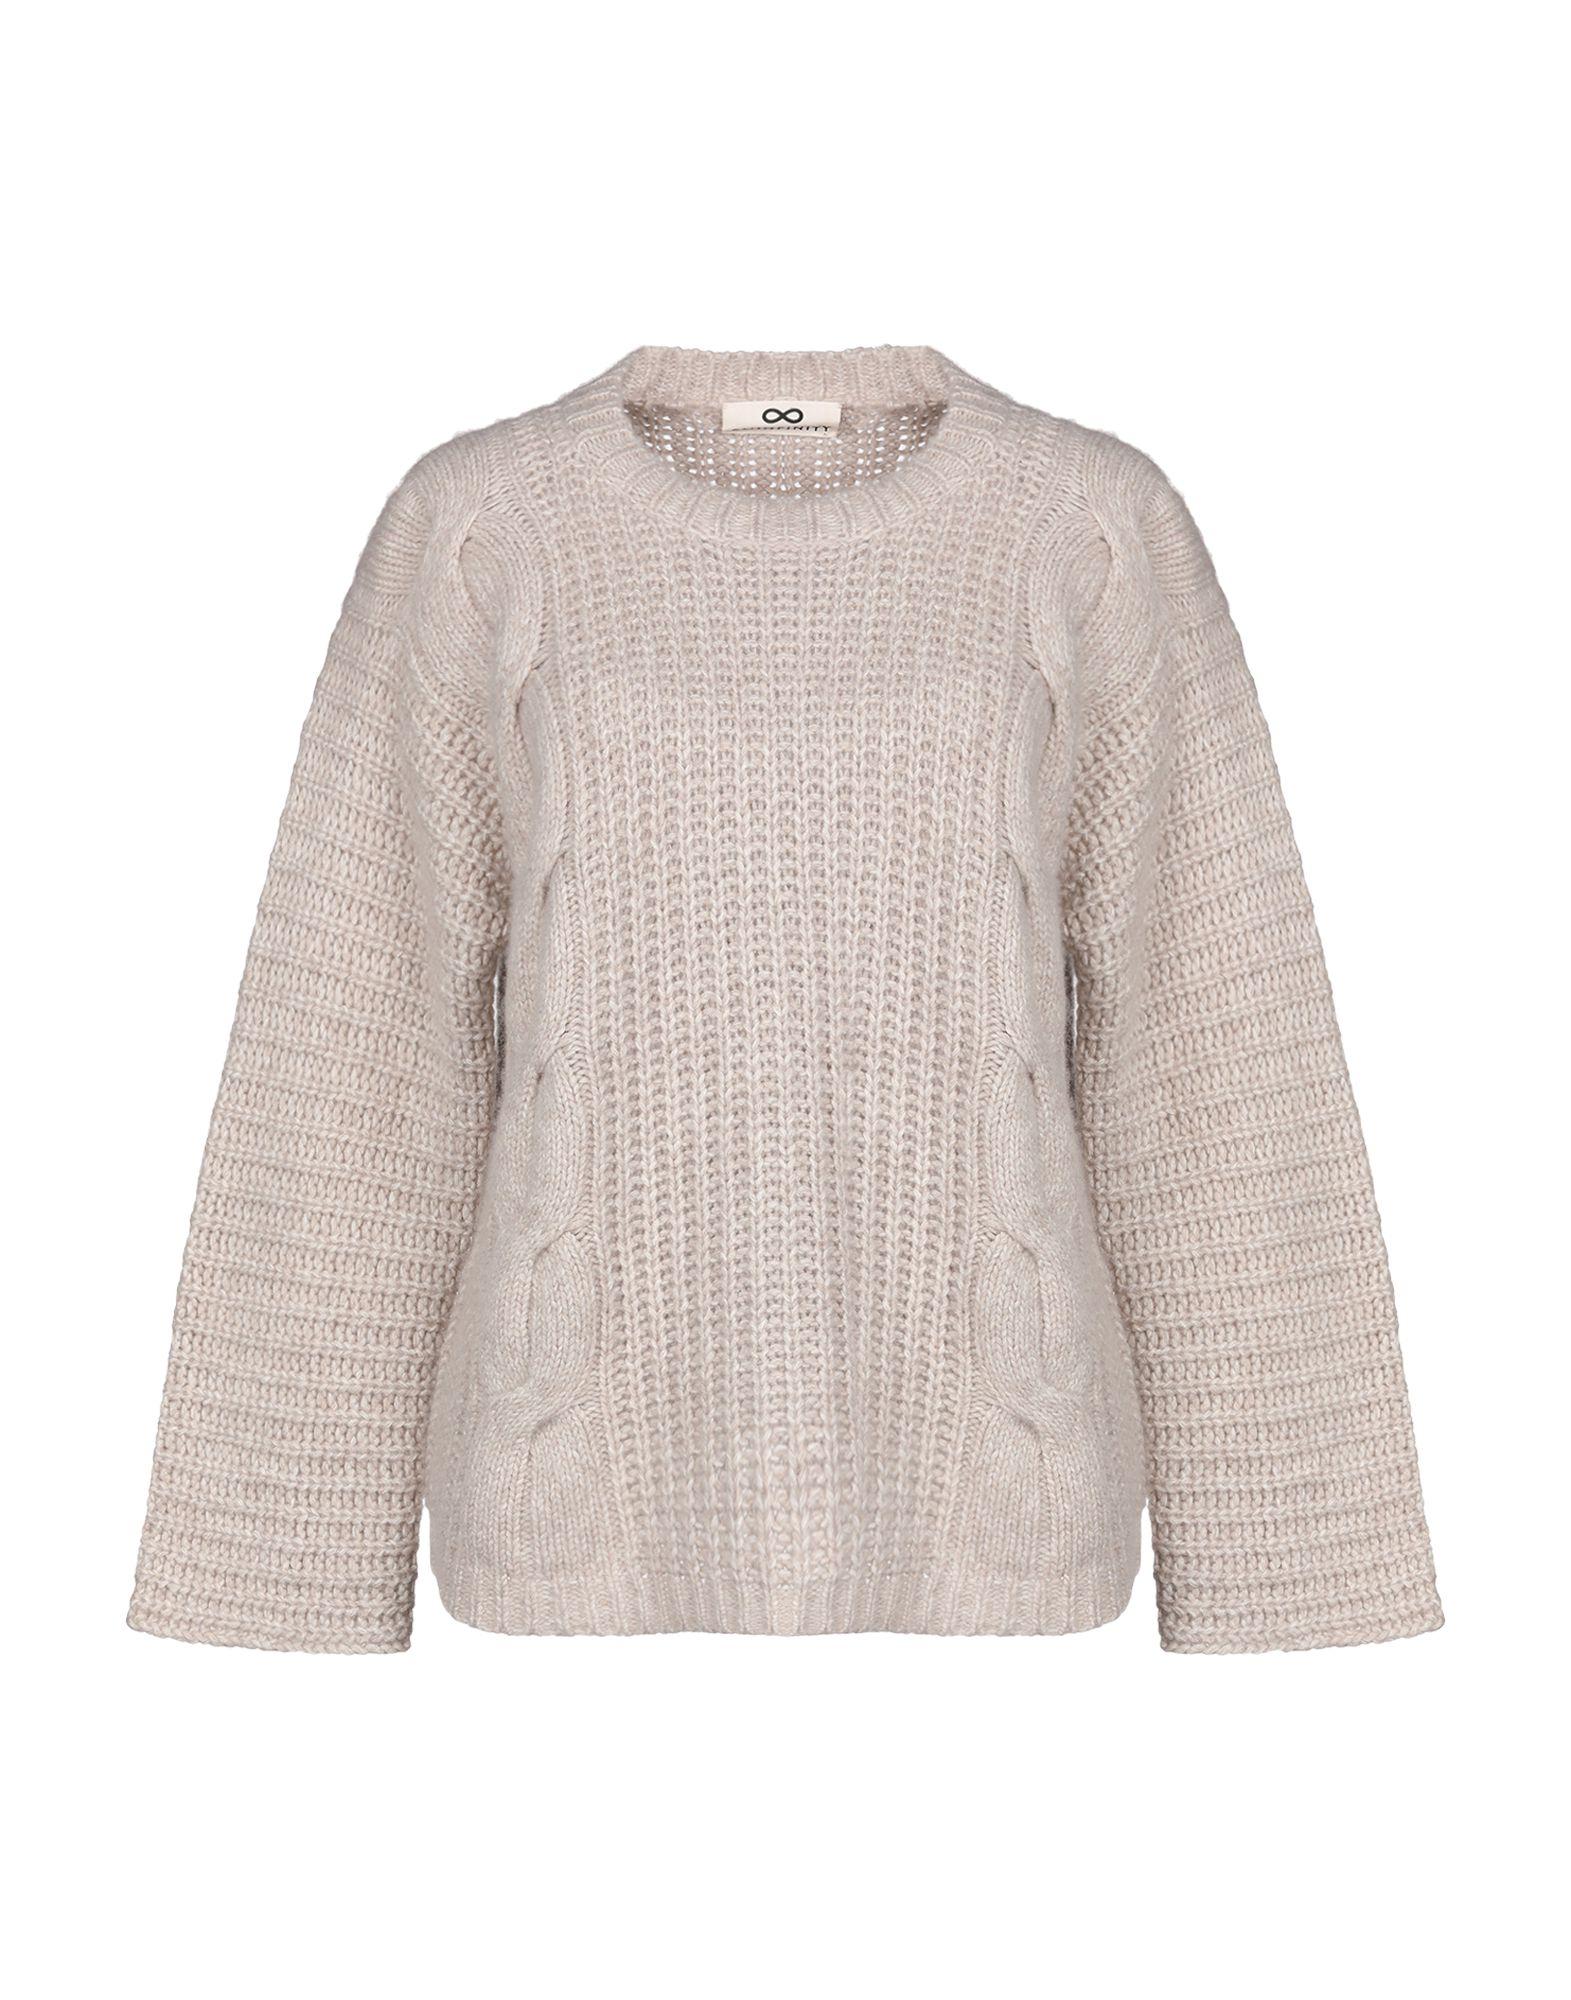 SMINFINITY Sweaters in Neutrals